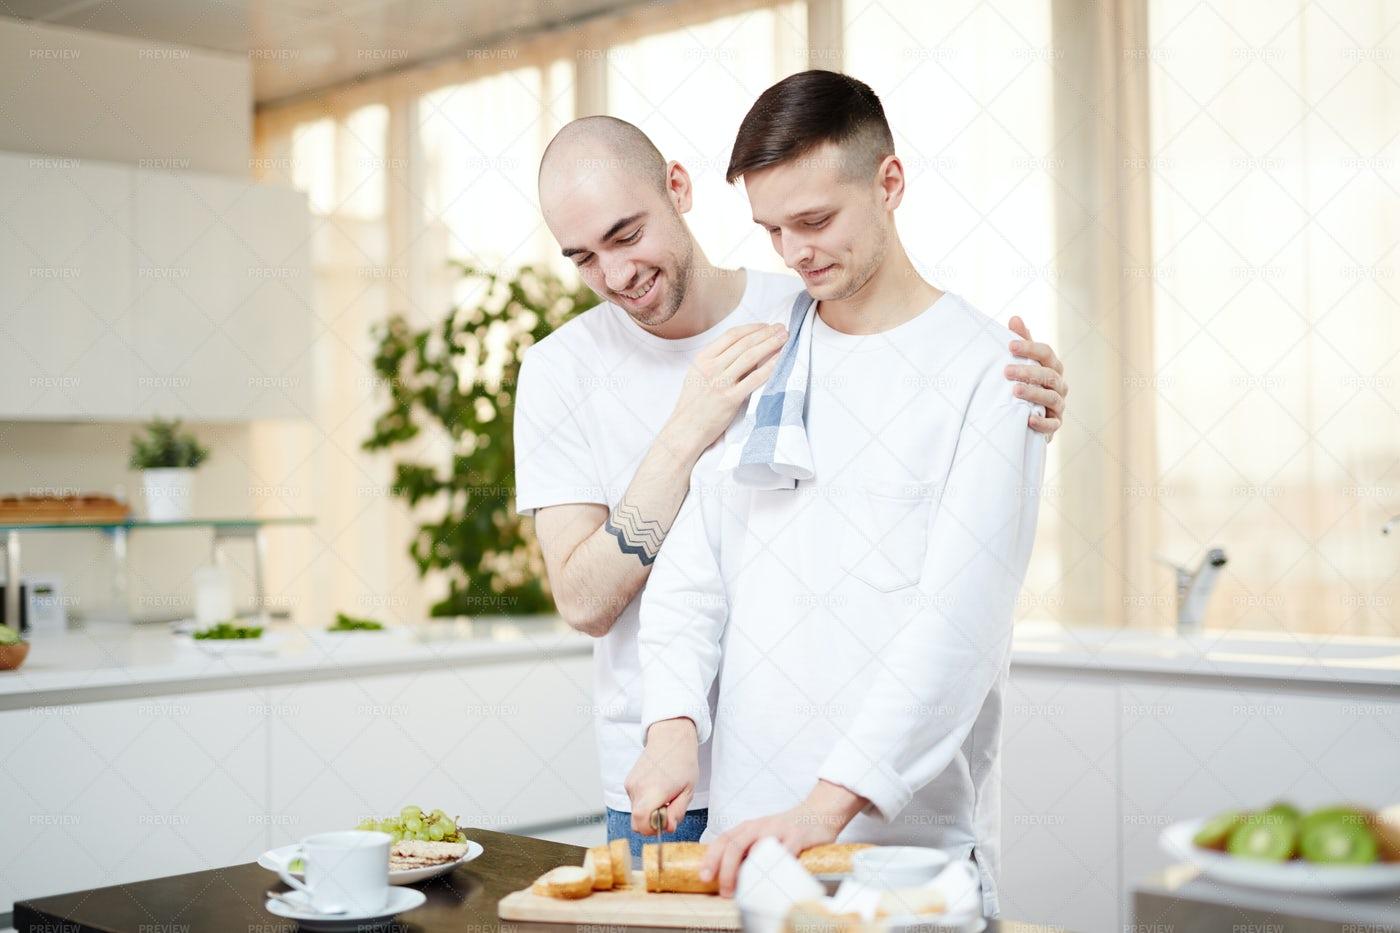 Men In The Kitchen: Stock Photos